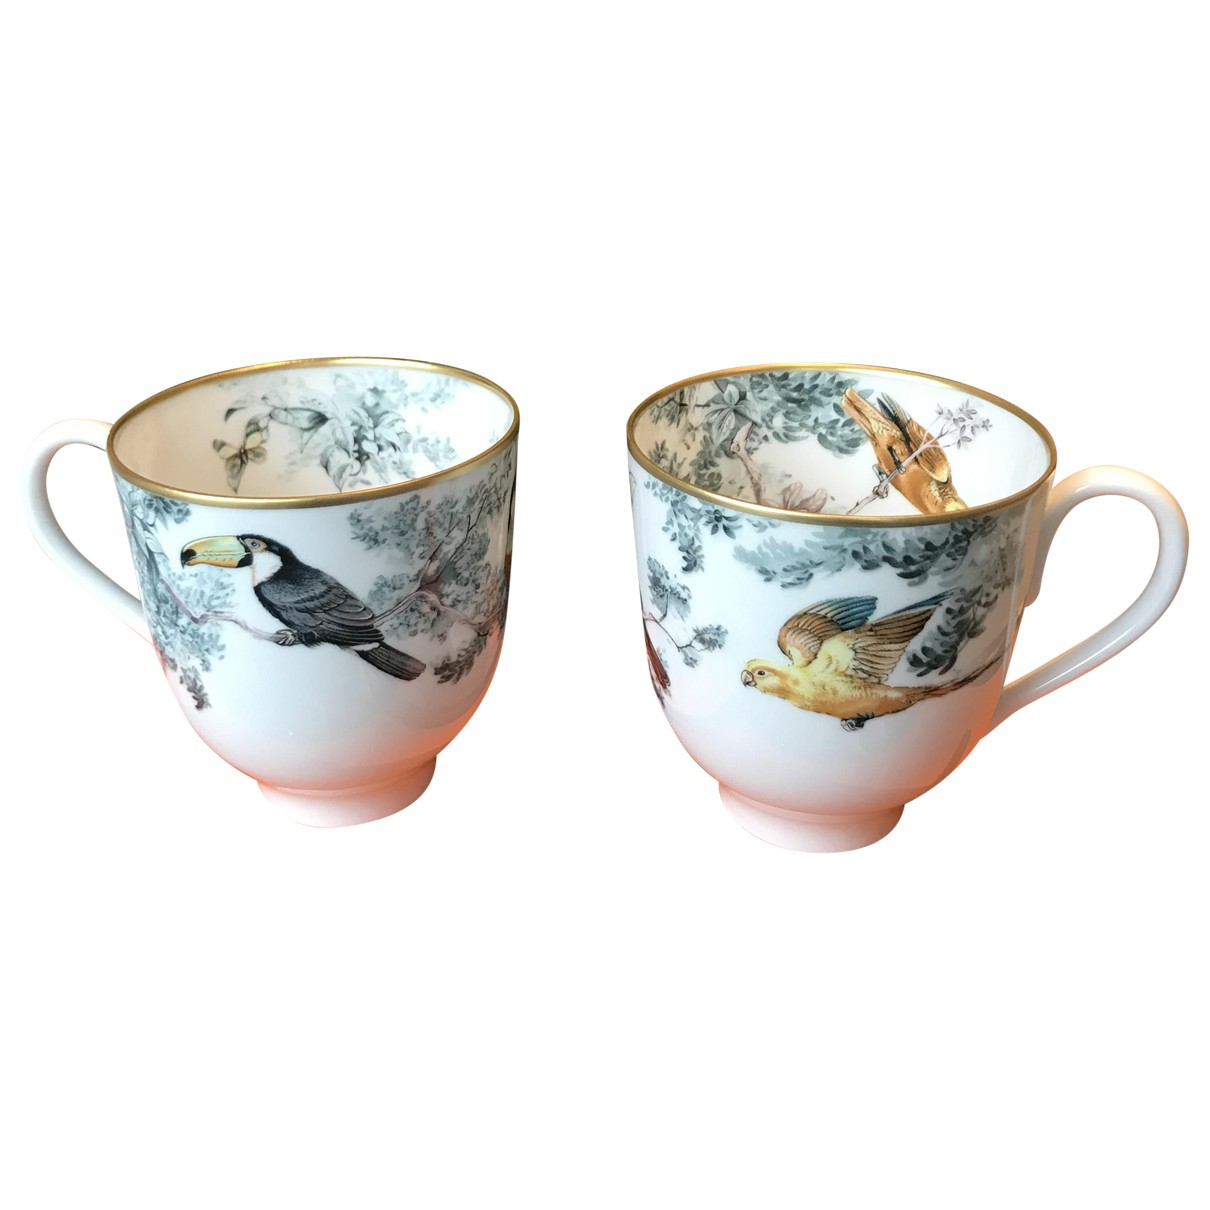 Juego de te/cafe Carnets dEquateur de Porcelana Hermes